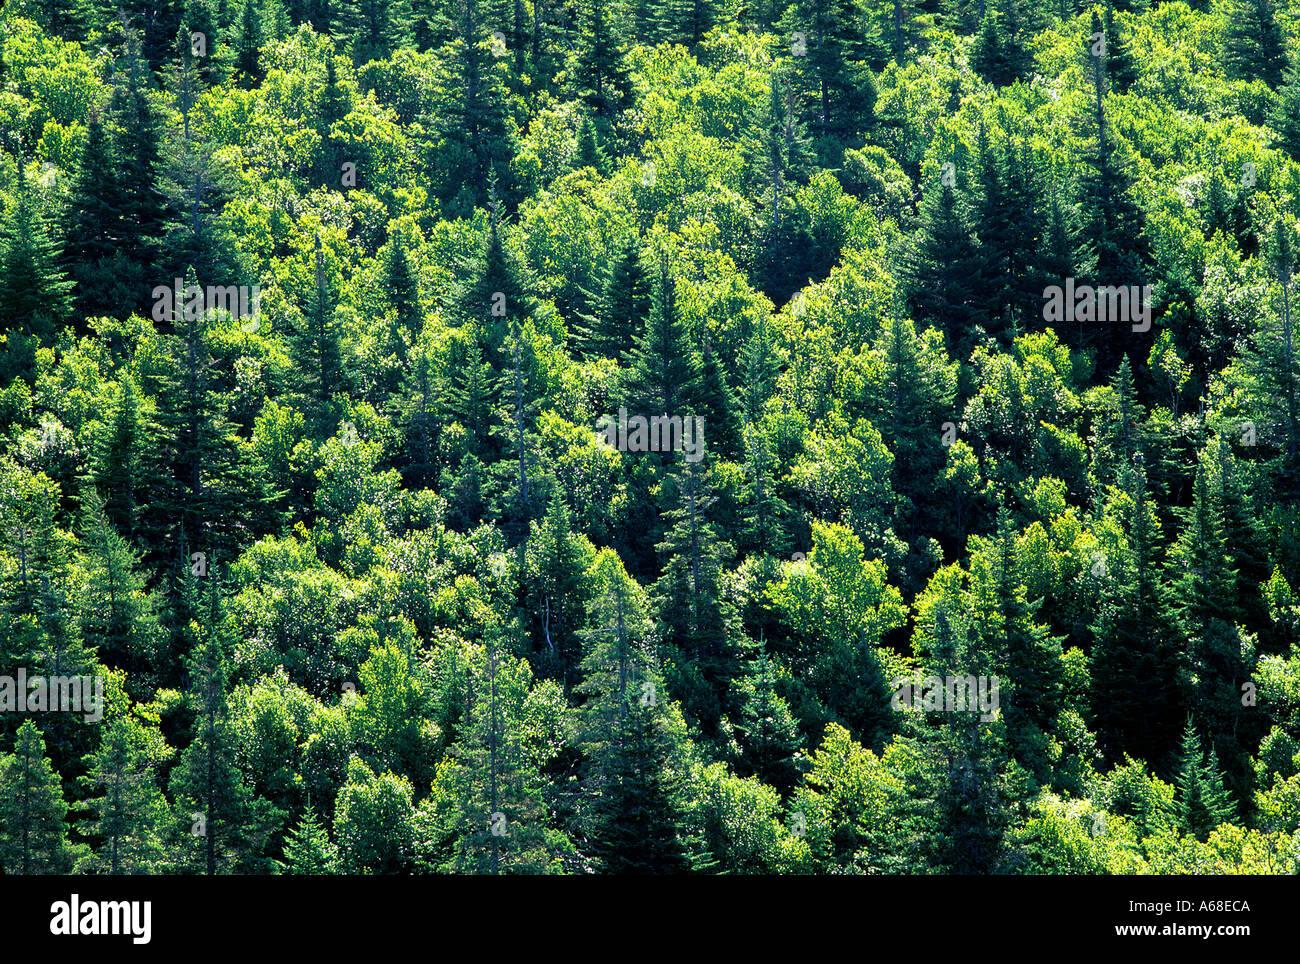 wallpaper canada trees newfoundland - photo #13